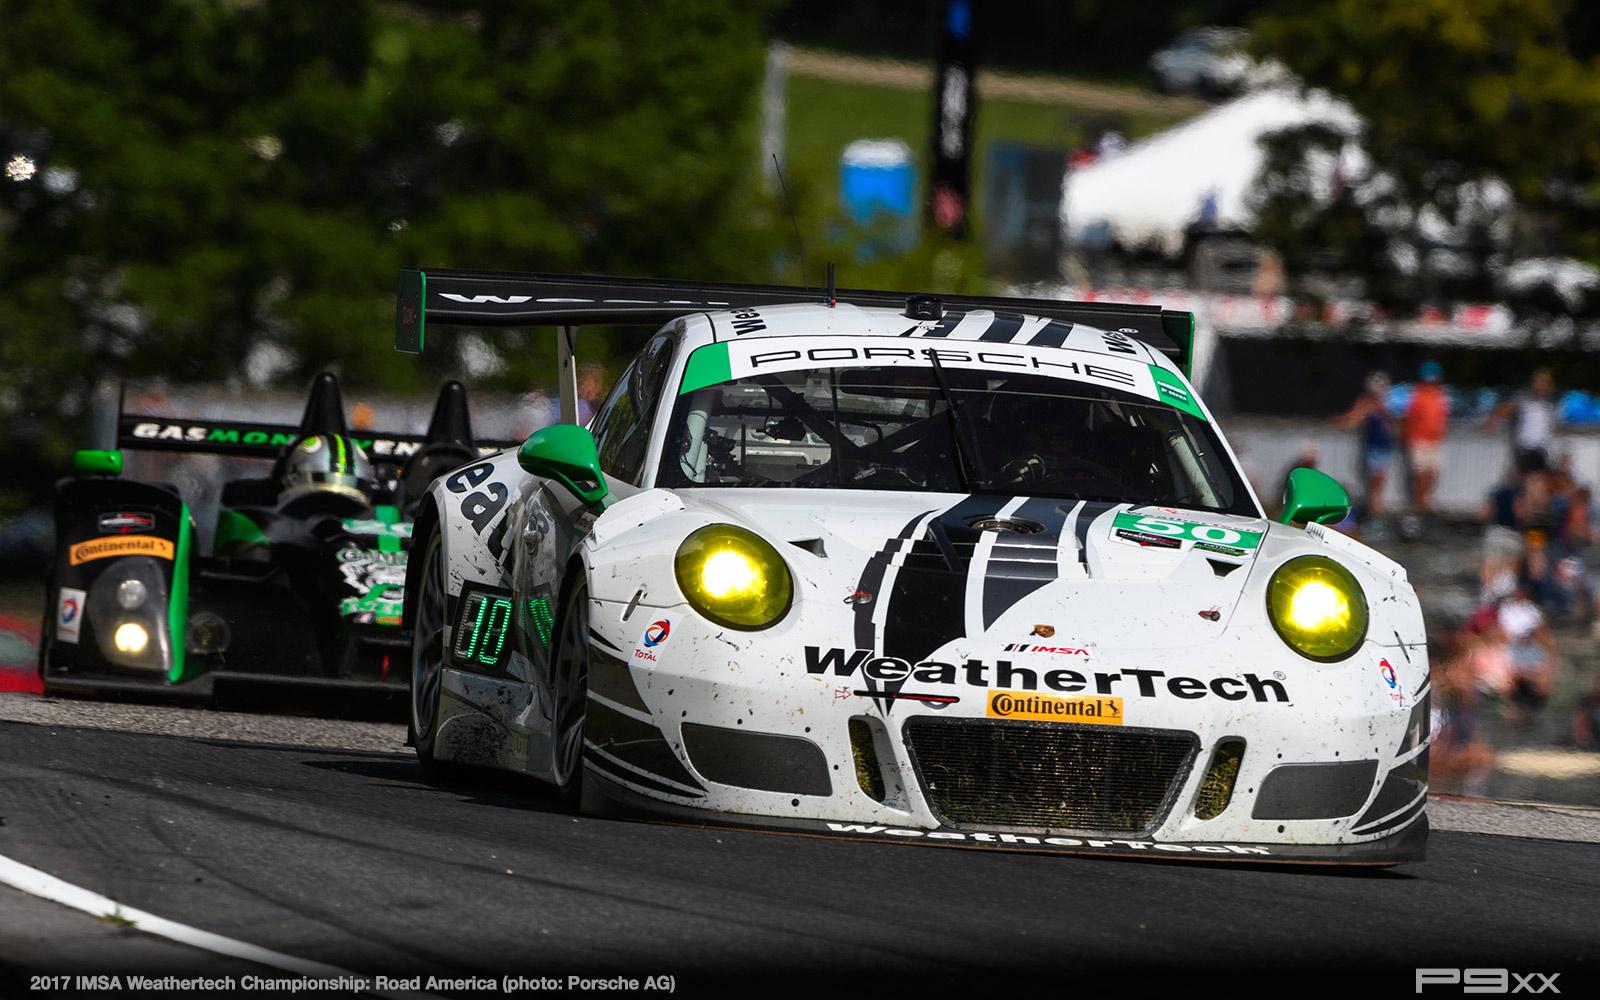 2017-IMSA-Weathertech-Road-America-Porsche-365